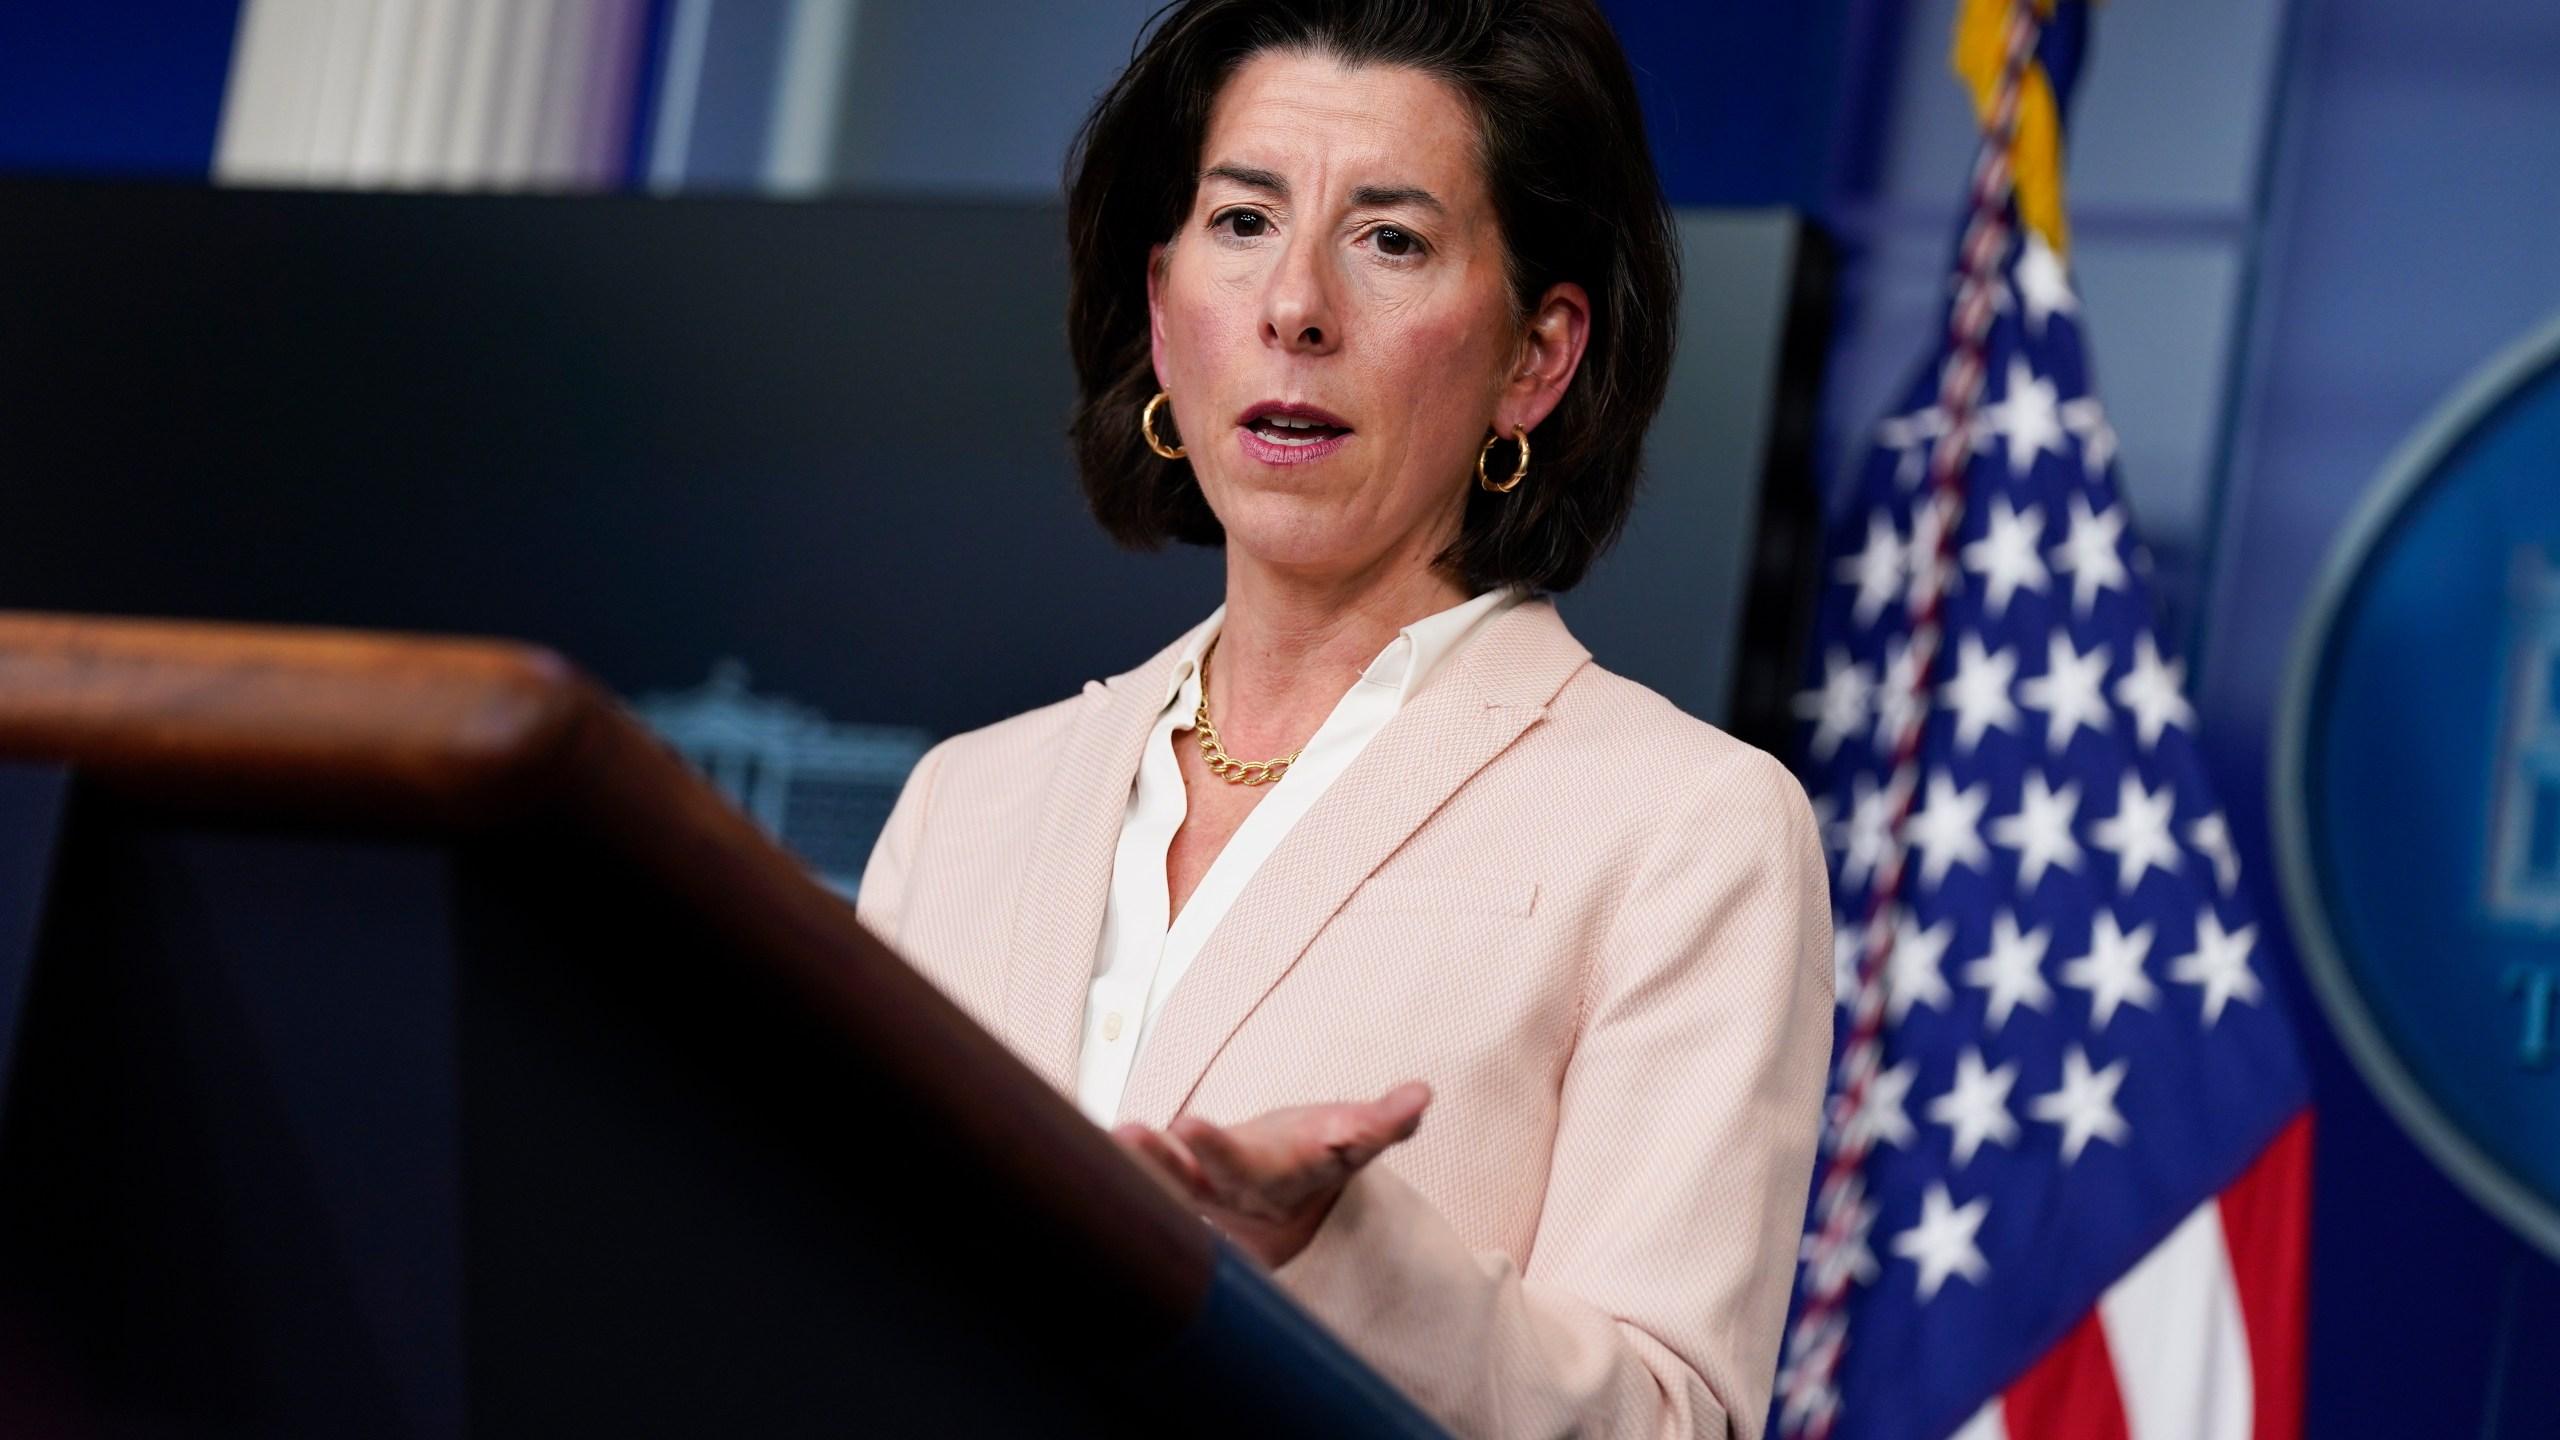 Gina Raimondo